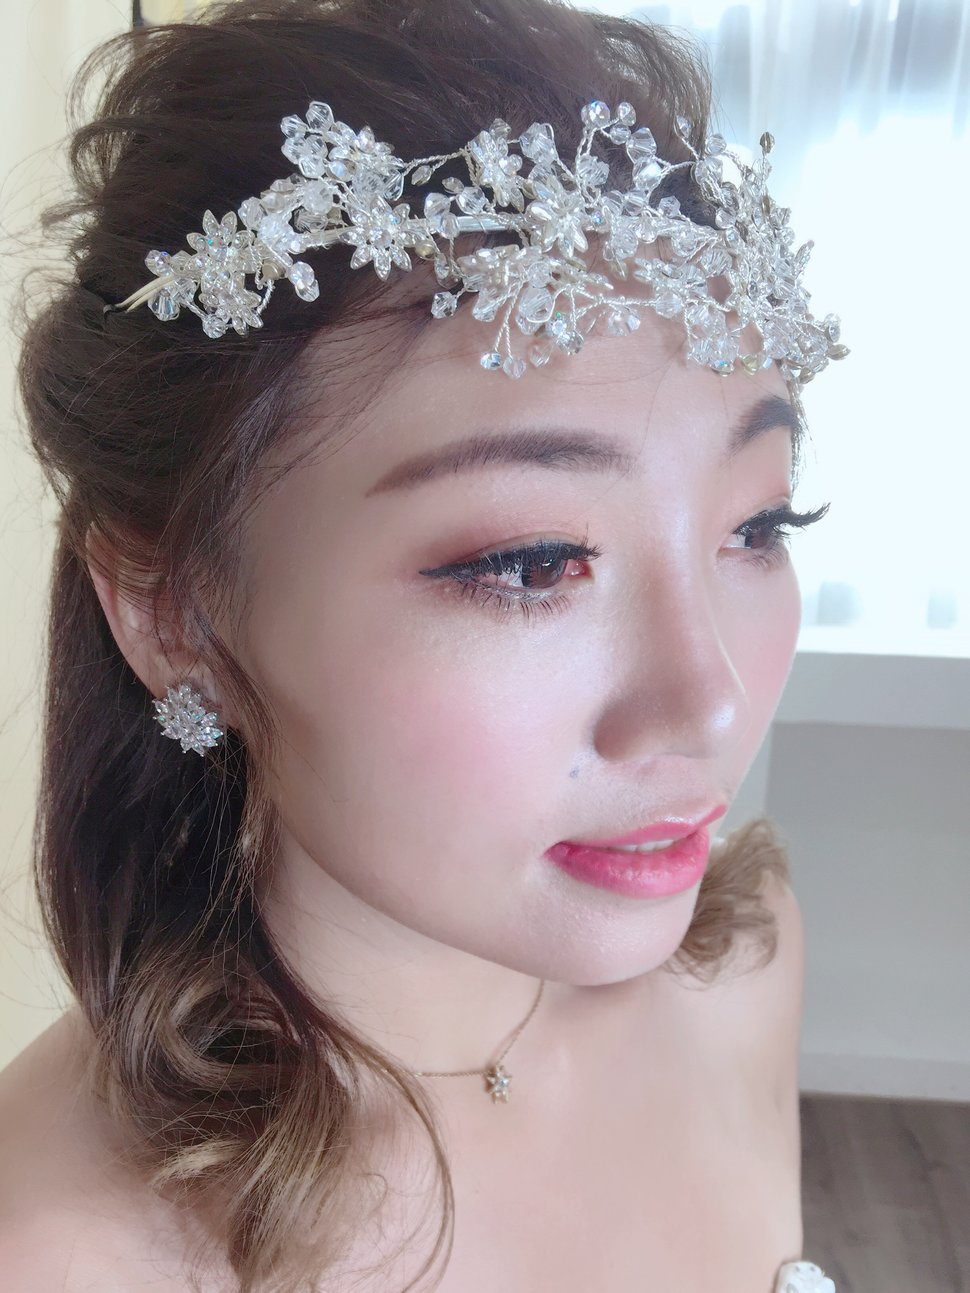 C7B40F87-5556-4EB4-8909-D24703CCAC19 - Beauty愛美麗·整體造型 - 結婚吧